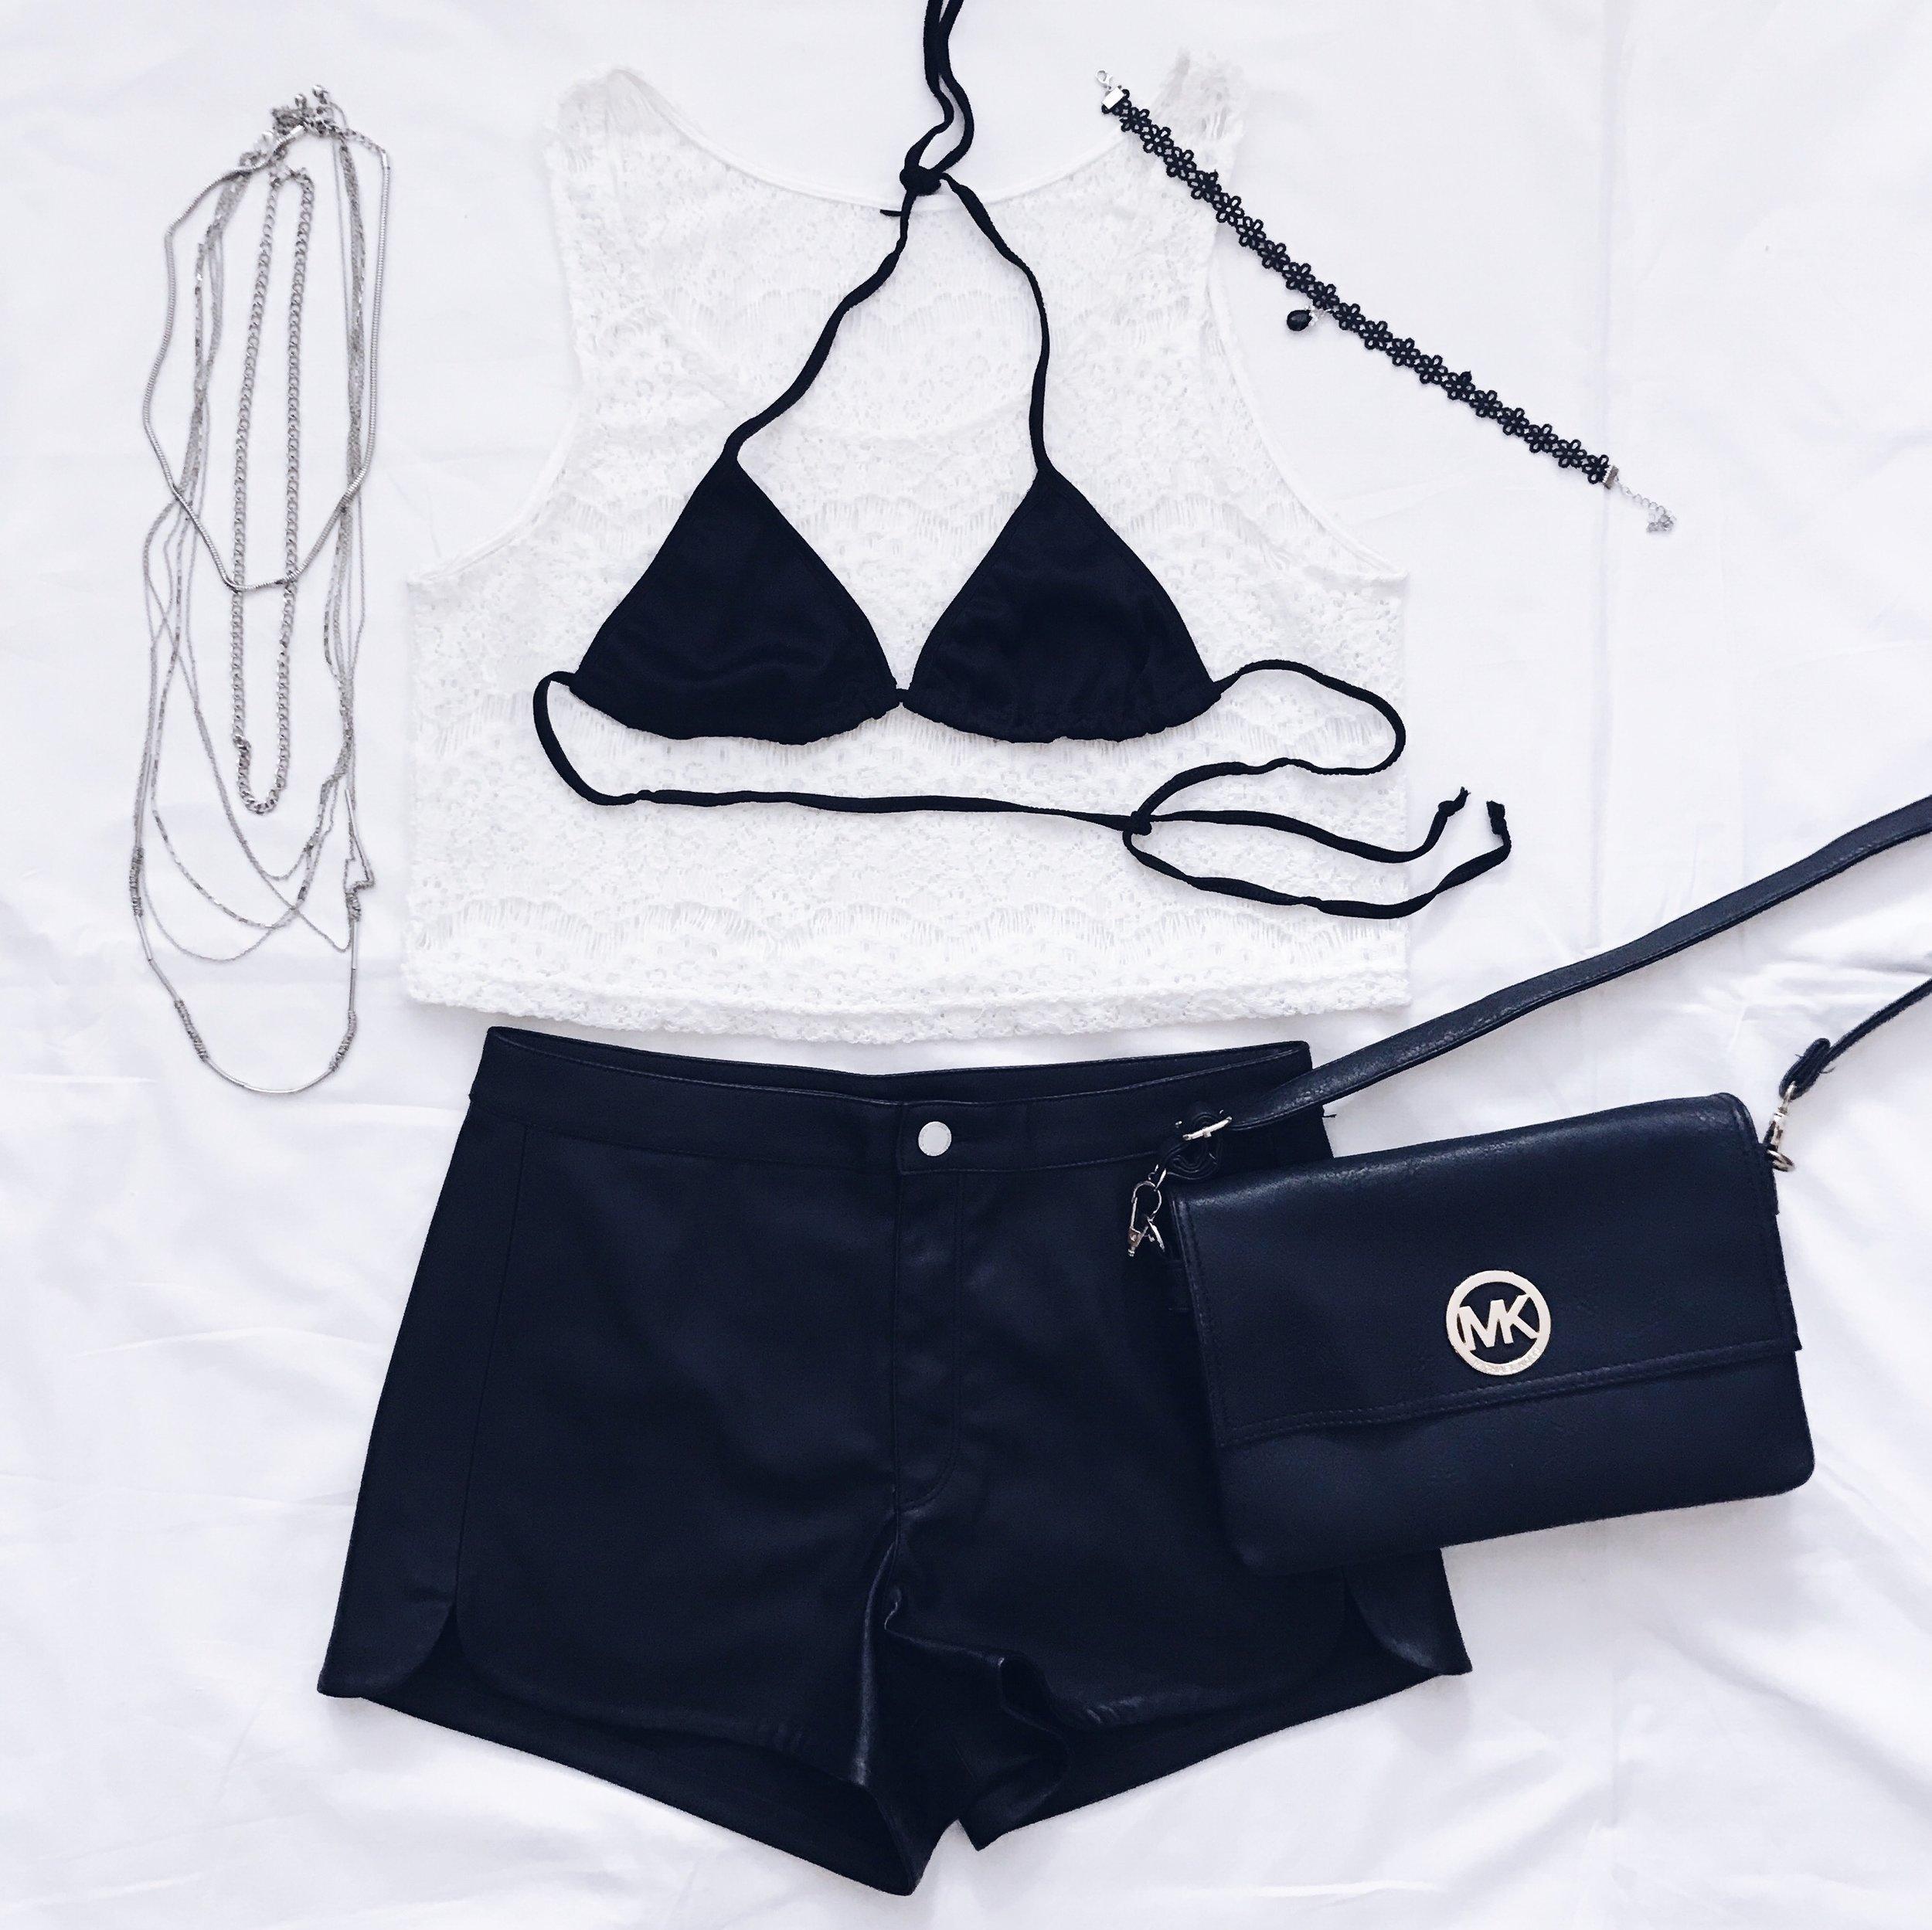 Бял Тон: Terranova    Кожени панталонки: H&M    Чантичка: Michael Kors    Горнище на бански: Asos    Колие & Верижка: H&M    Choker: Amazon Fashion